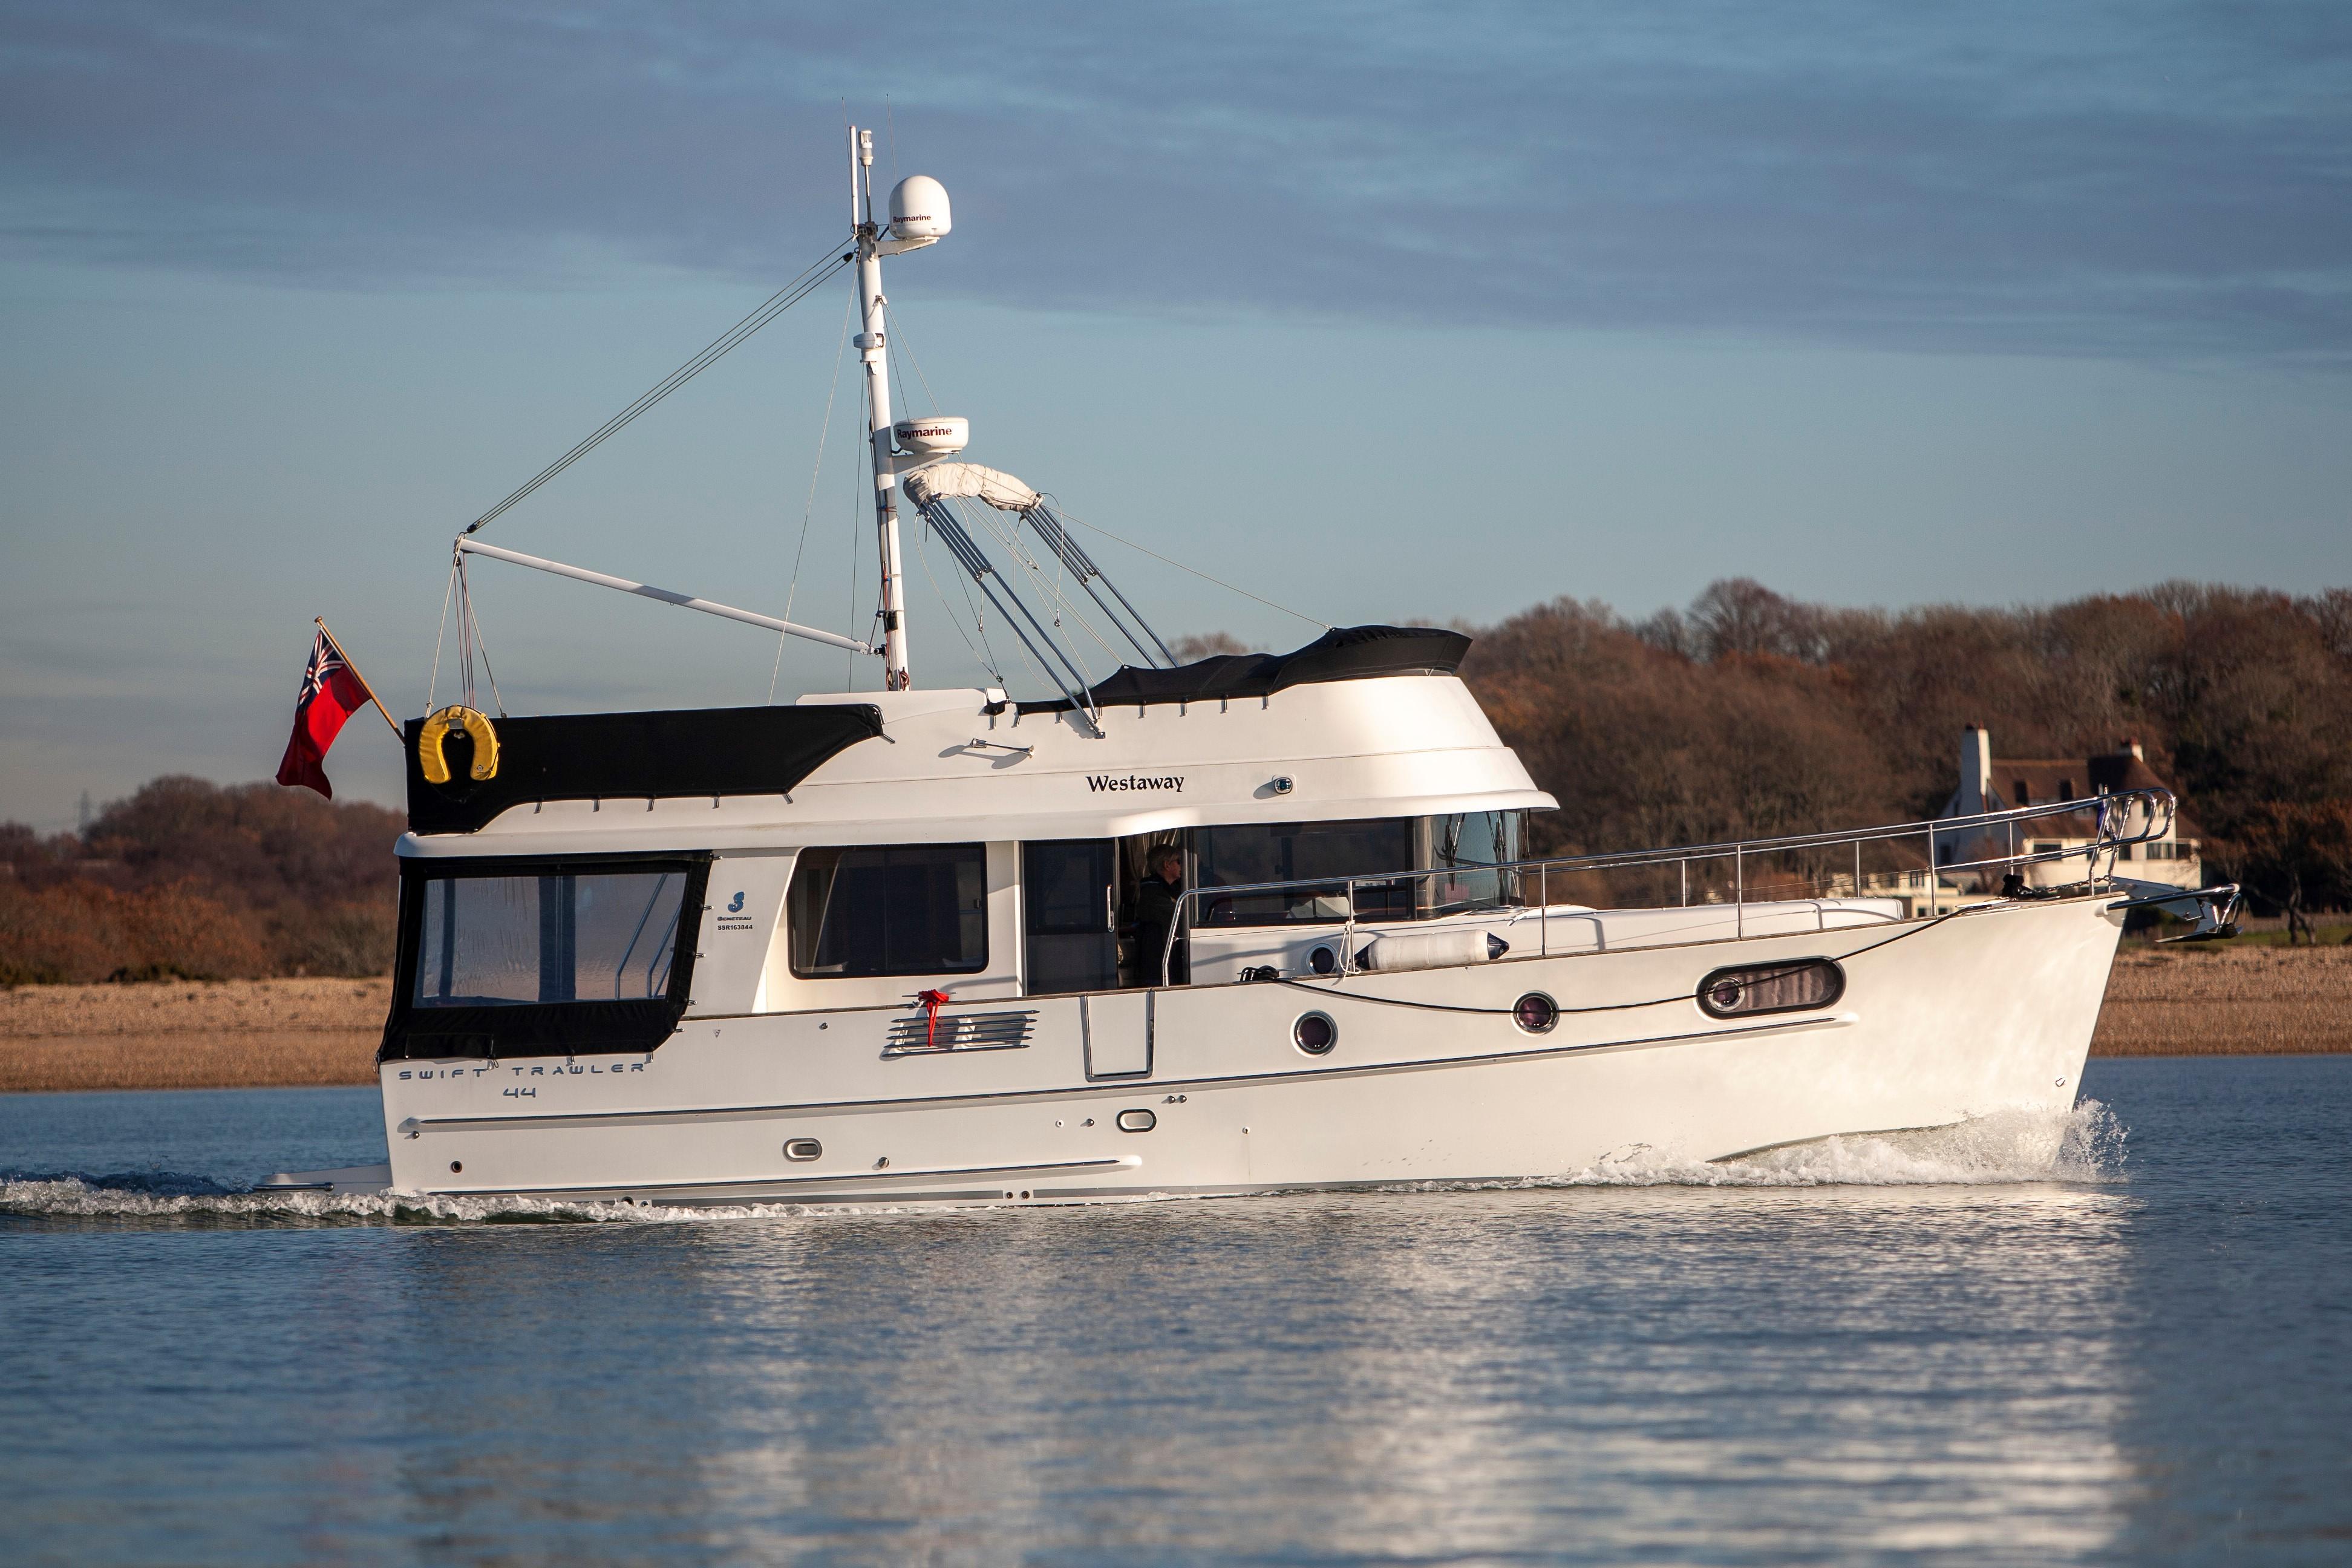 Beneteau Swift Trawler 44 Beneteau Swift Trawler 44 - Westaway